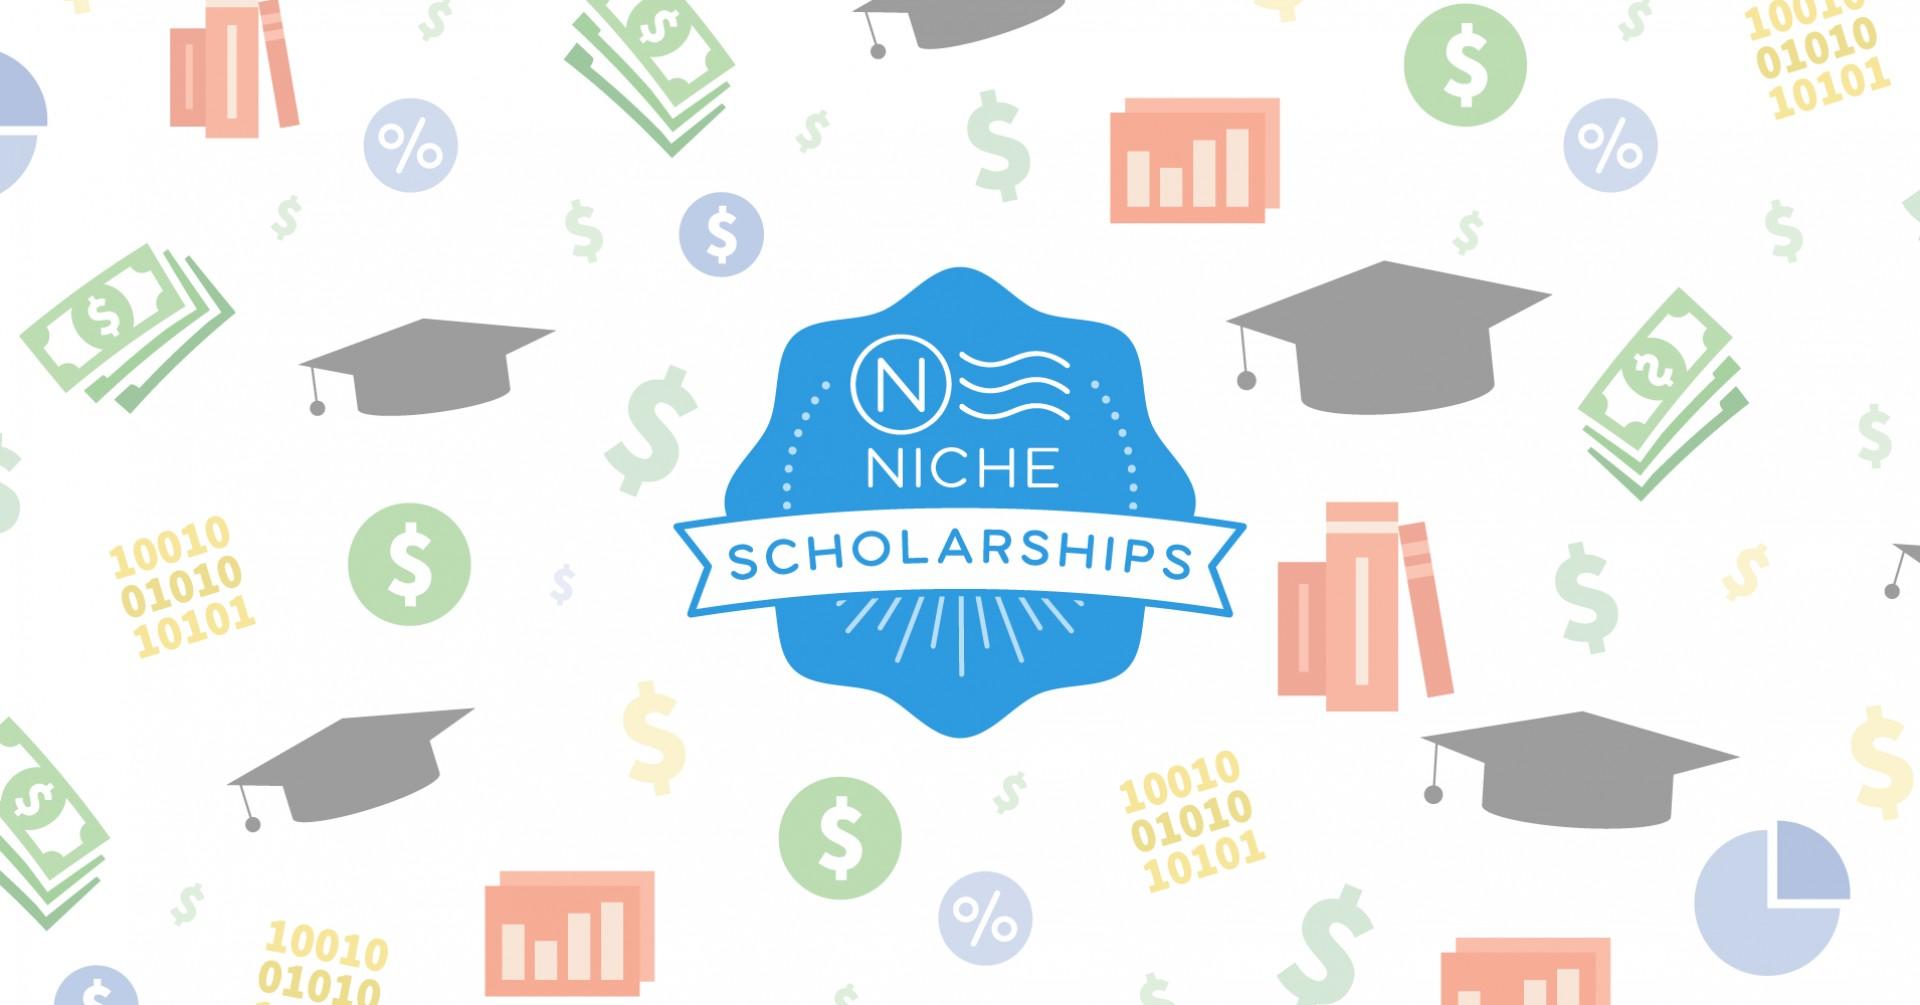 005 Essay Example Niche No Scholarship Marvelous Reddit Winners 1920